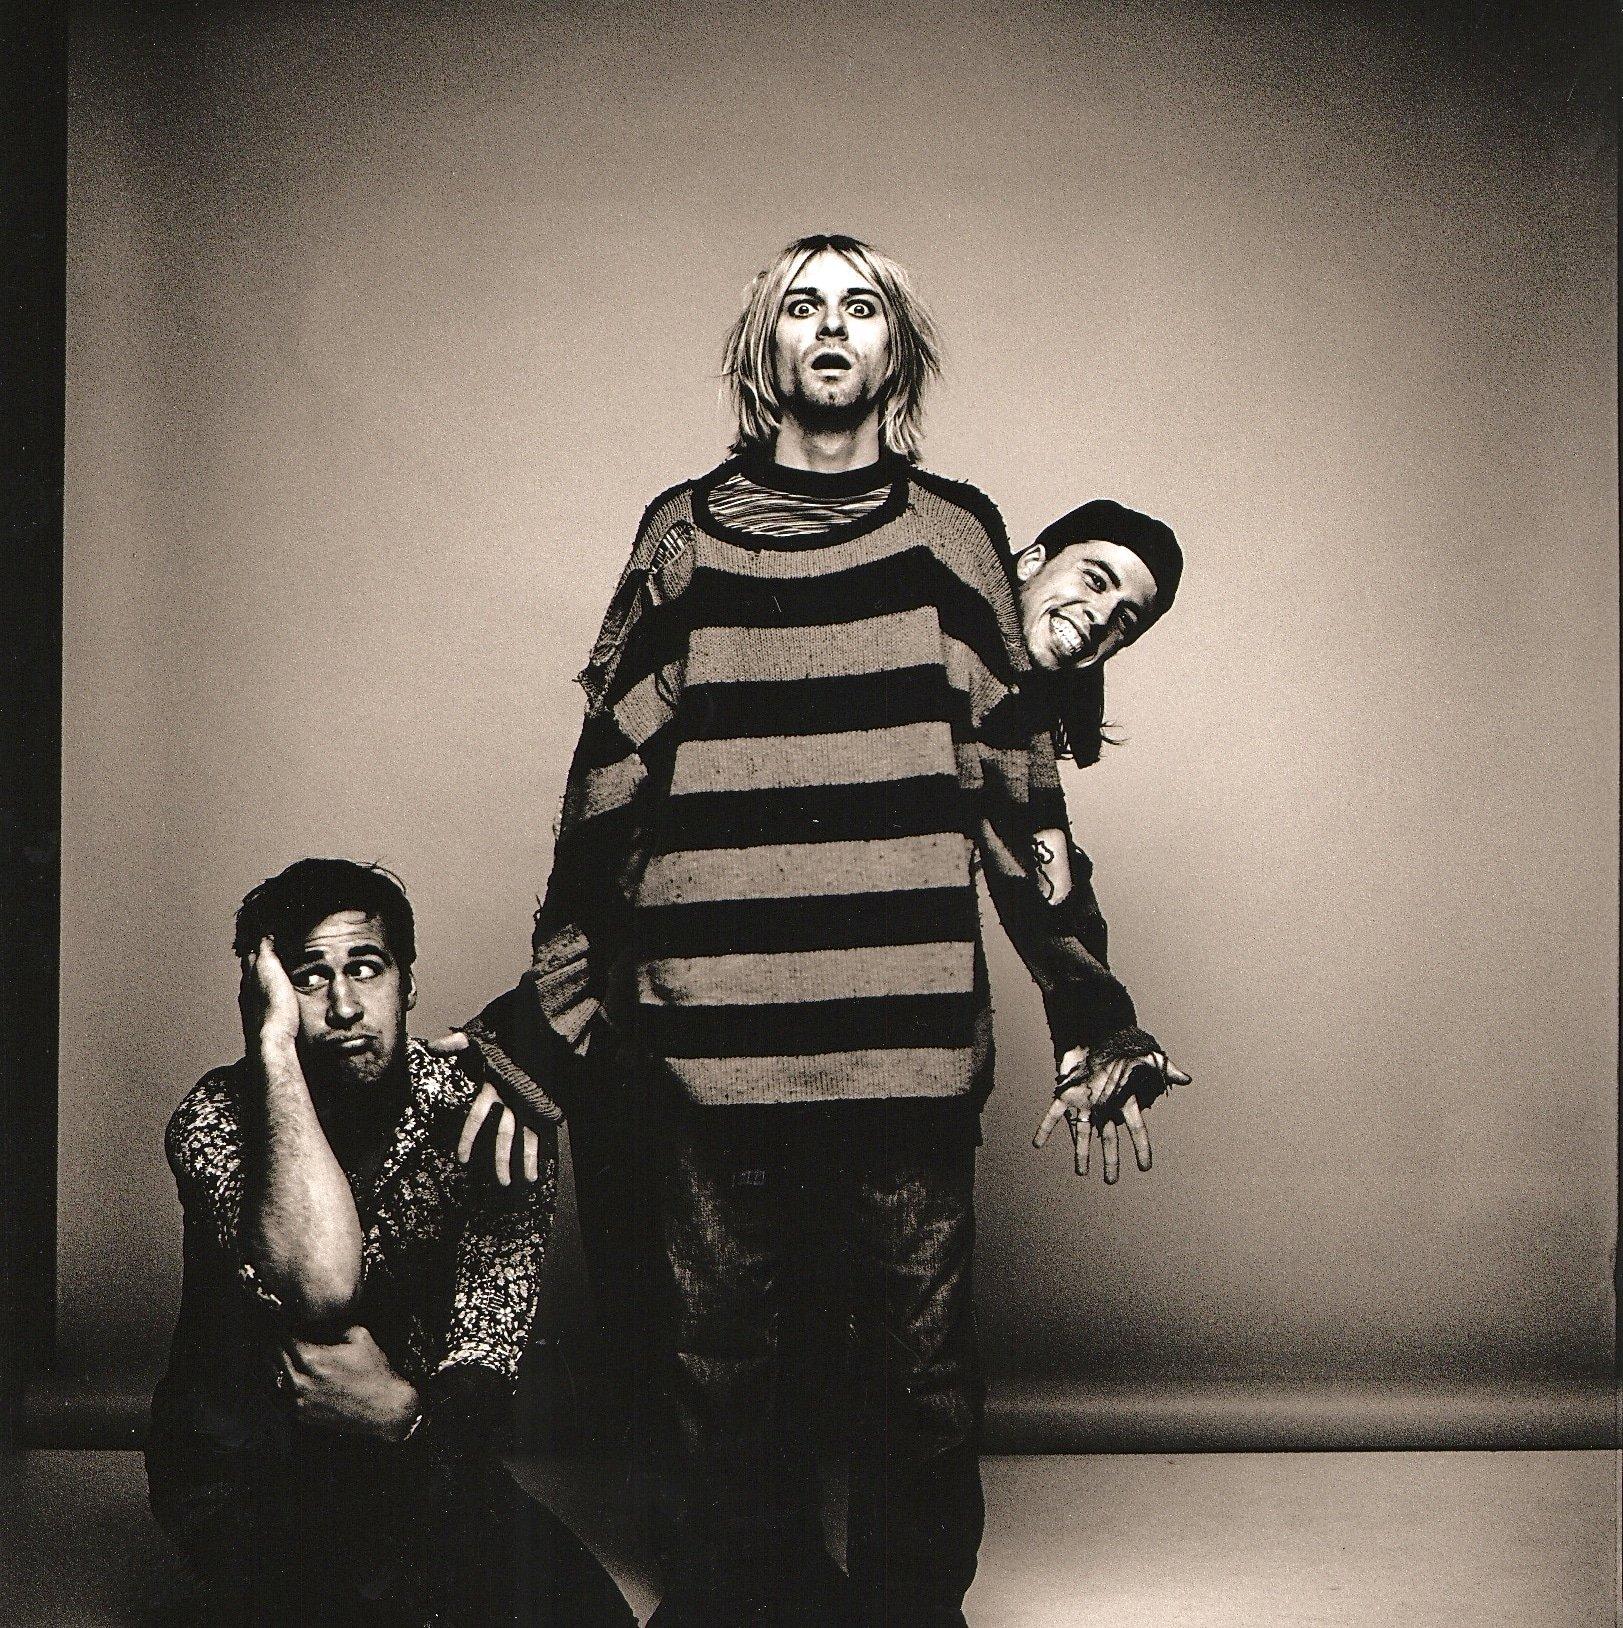 Nirvana - Original Black & White Photograph by Anton Corbijn